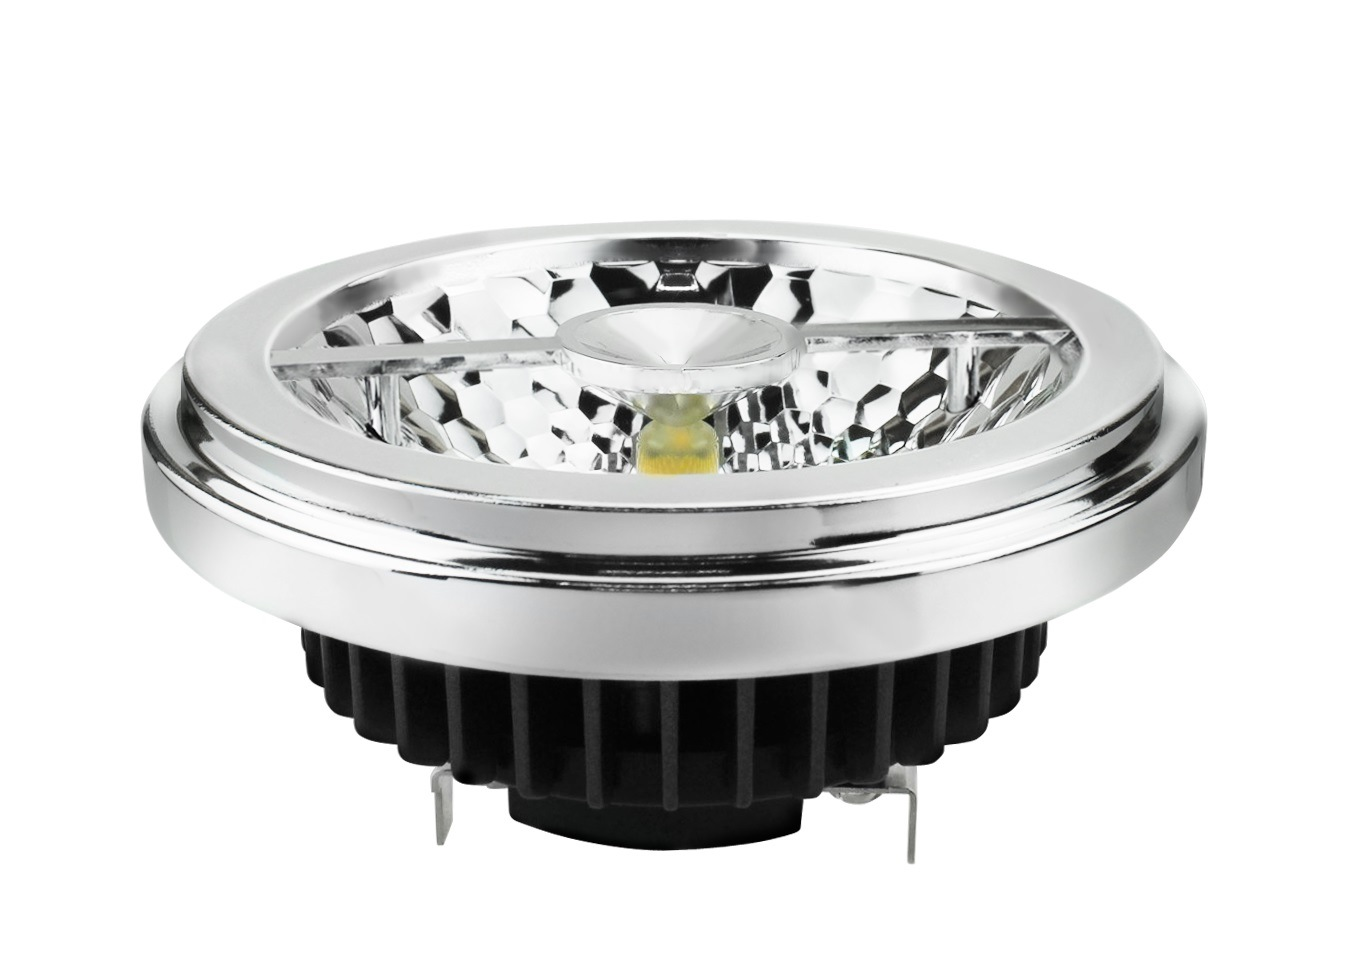 Glare-Free 15W 95ra 860lm Retrofit LED AR111 Light Bulb (LeisoA)